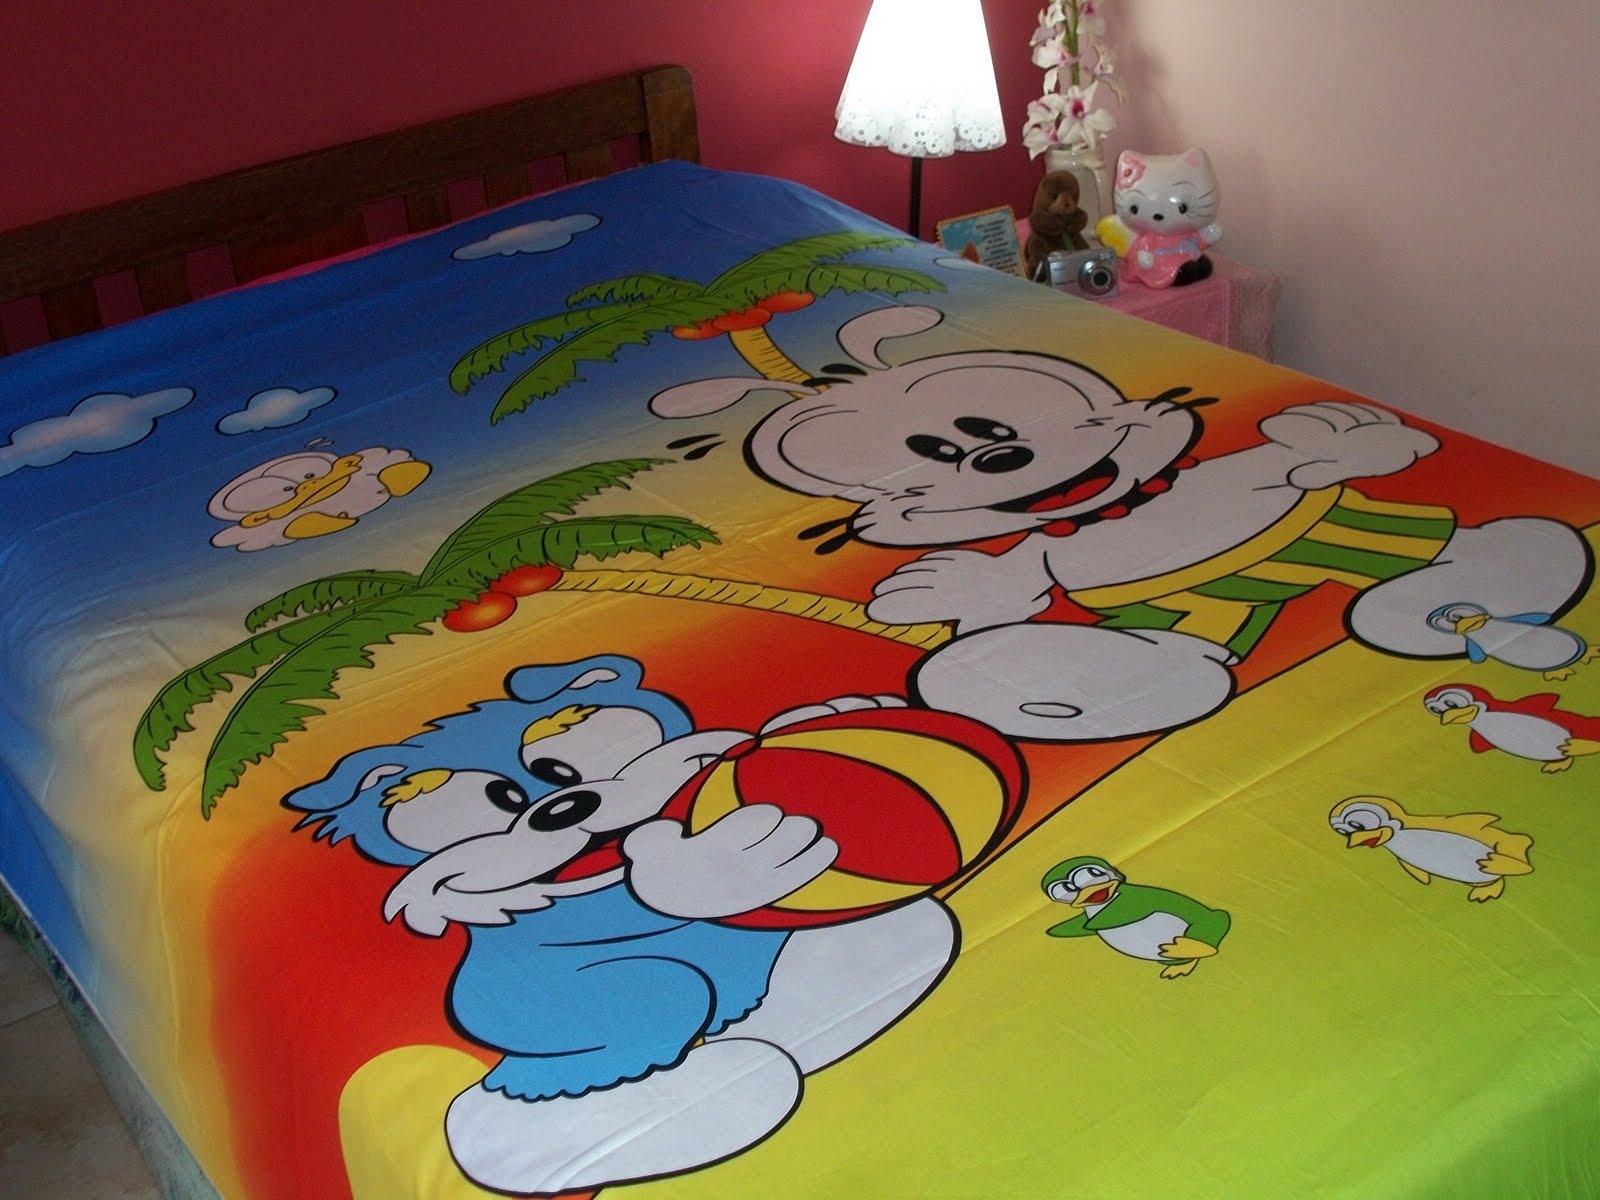 Creaciones y dise o betty juegos de camas para ni os o ni as - Disenos de camas para ninos ...